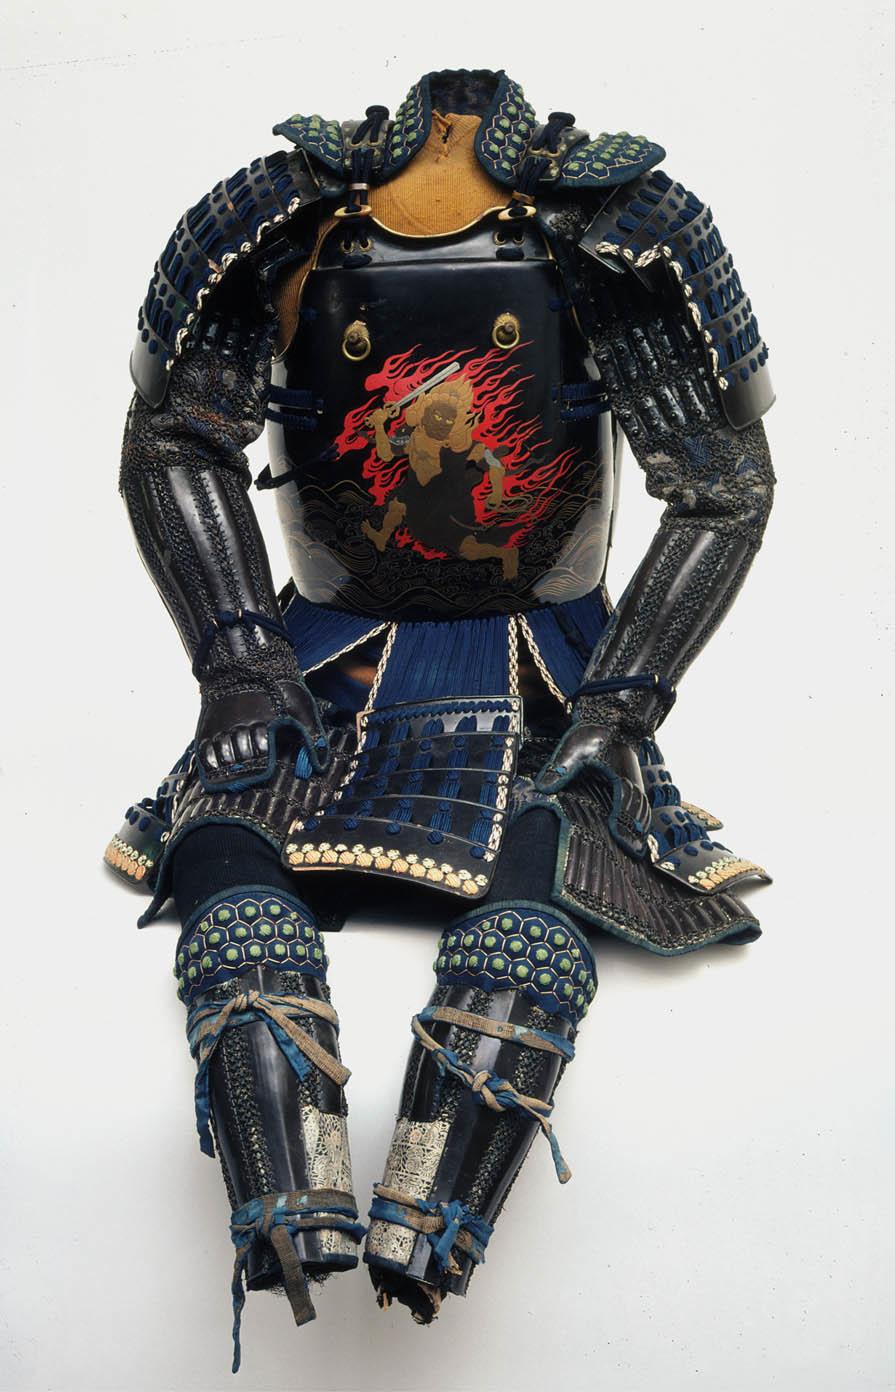 Cool 4 Armed Samurai Art